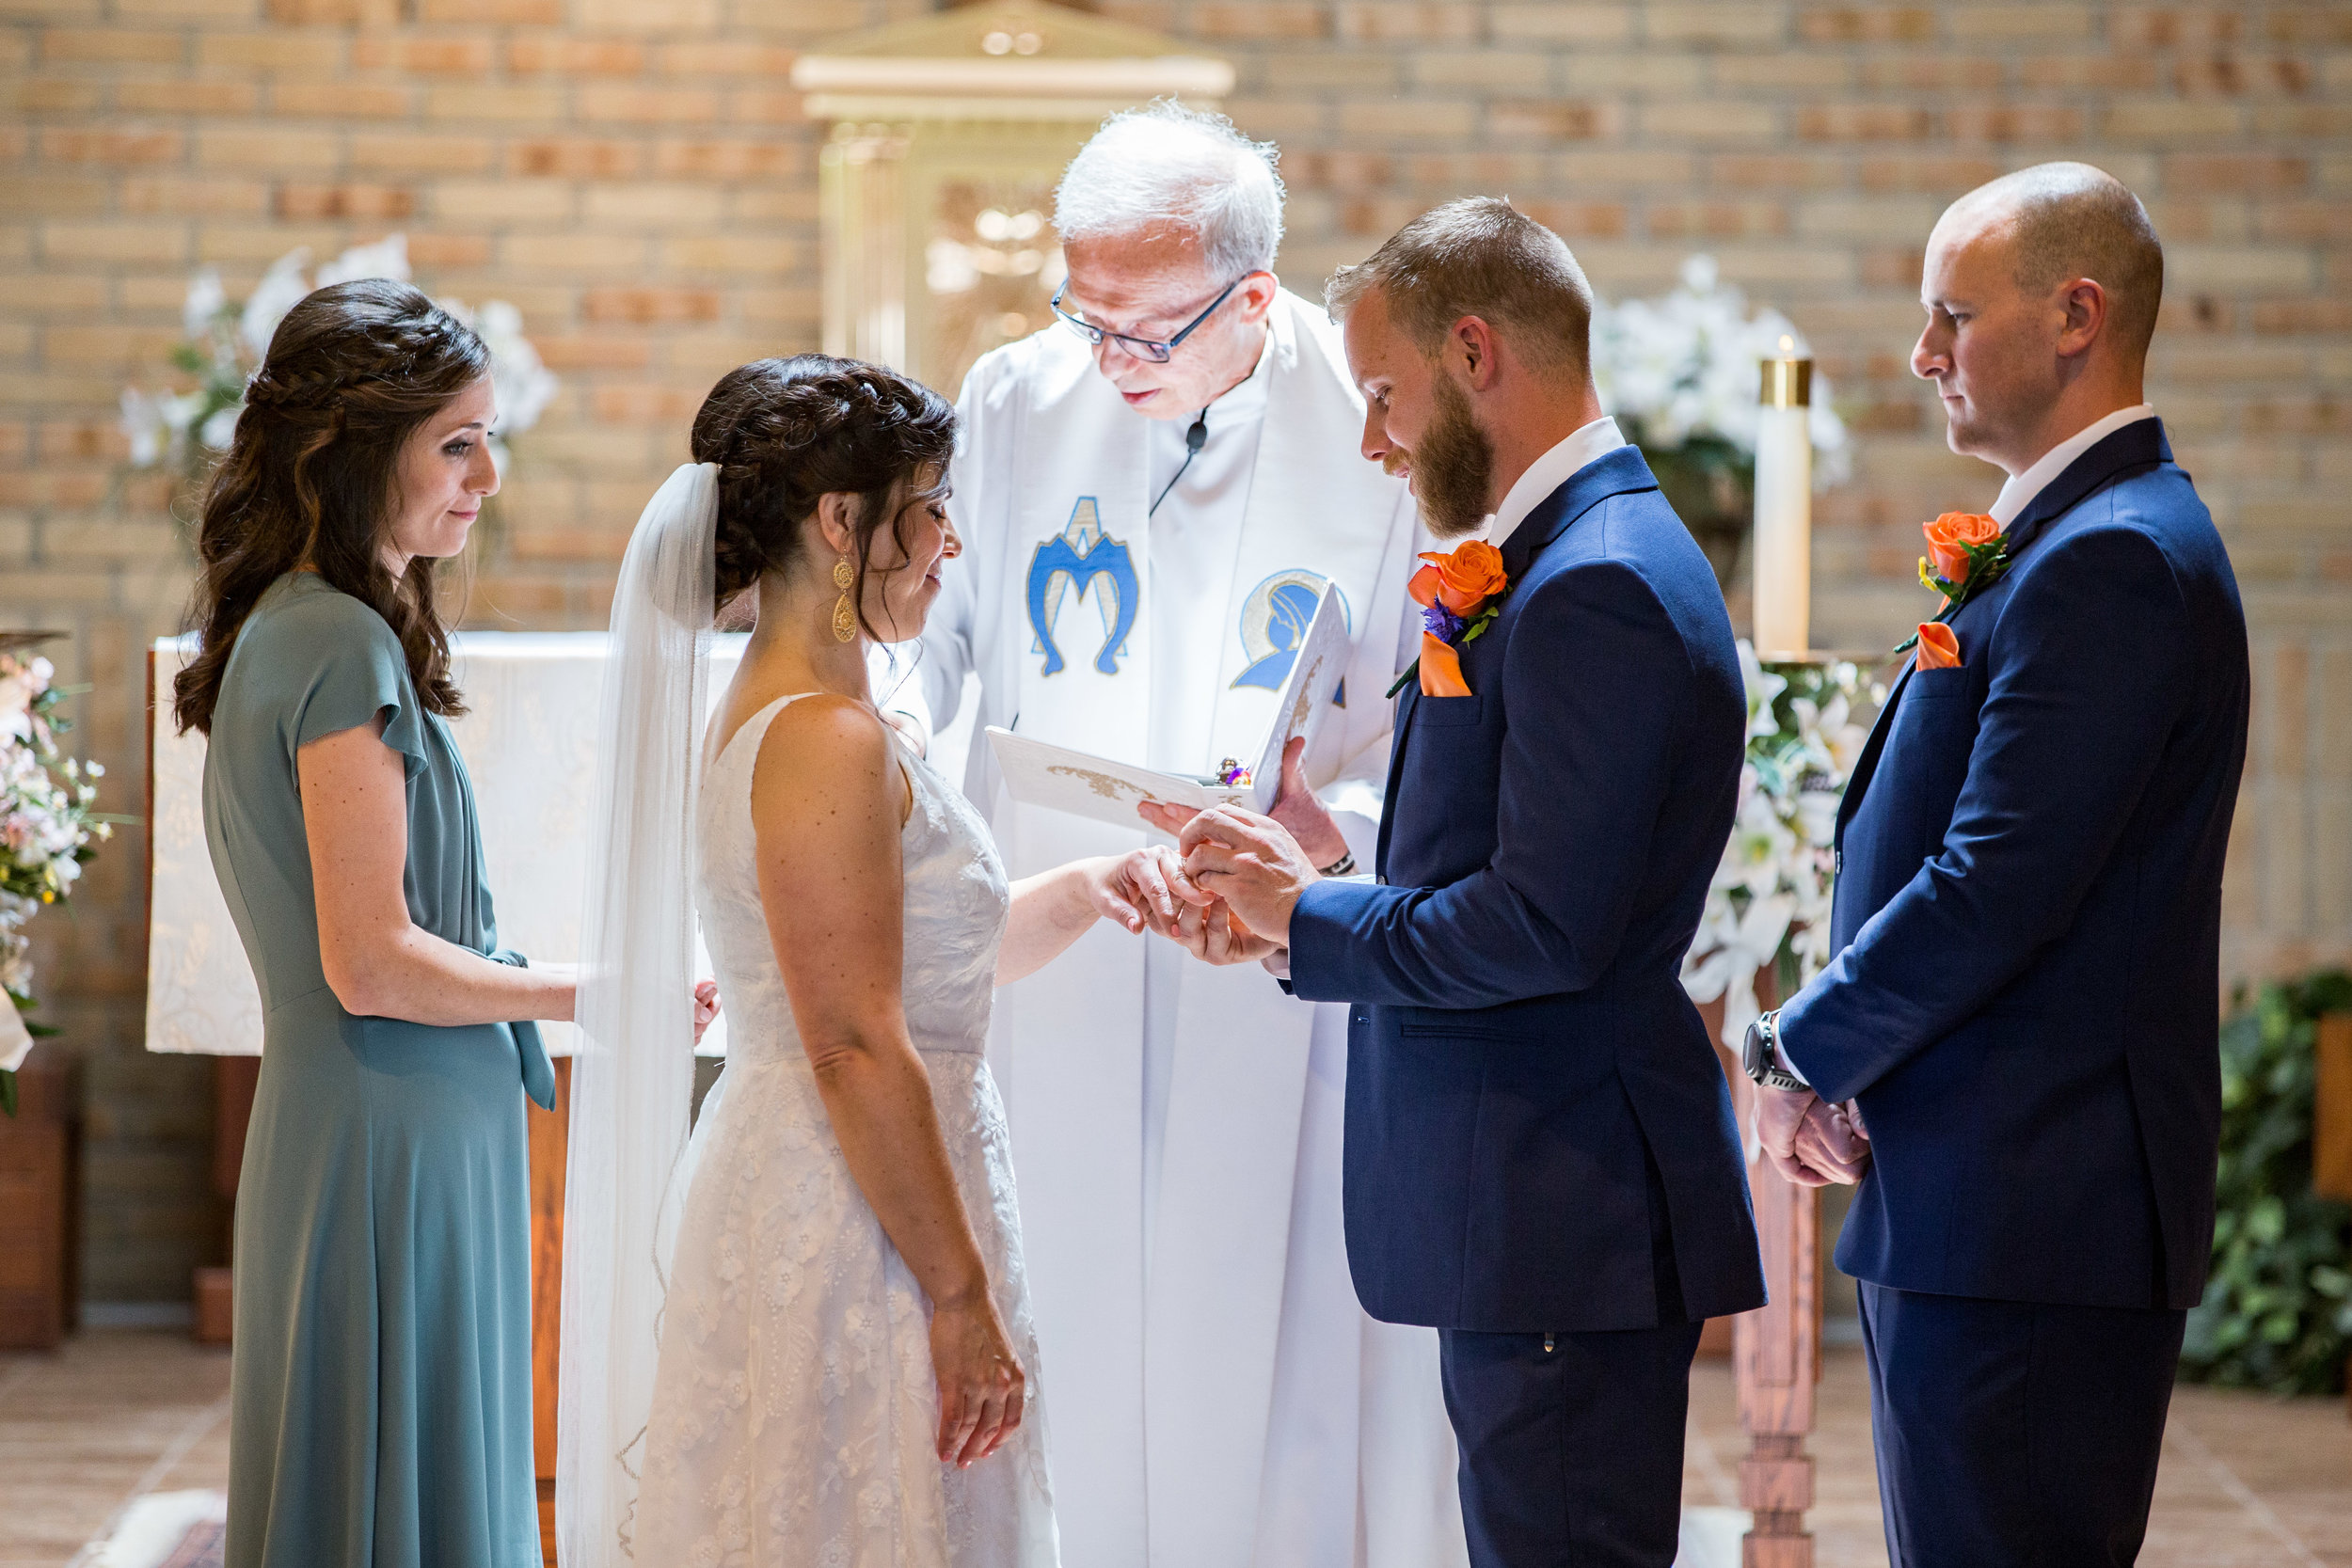 Natalie and Dallas Mooney Wedding 6-8-19_Tania Watt Photography-124.jpg